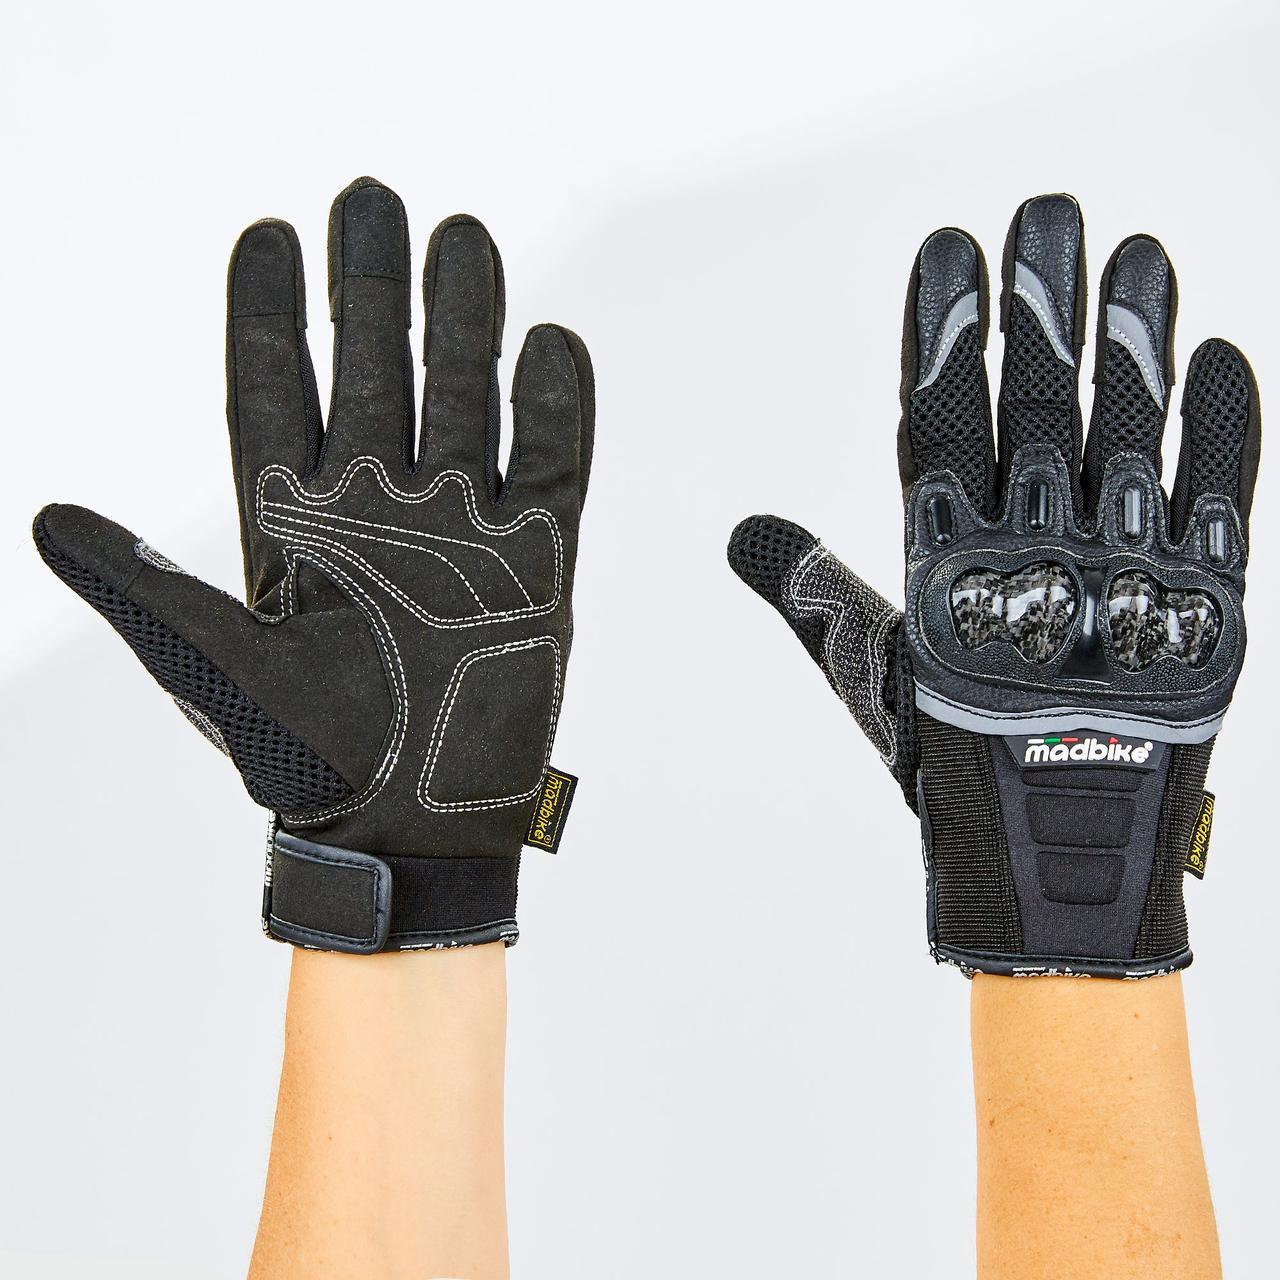 Мотоперчатки MADBIKE MAD-03 размер M-2XL черный